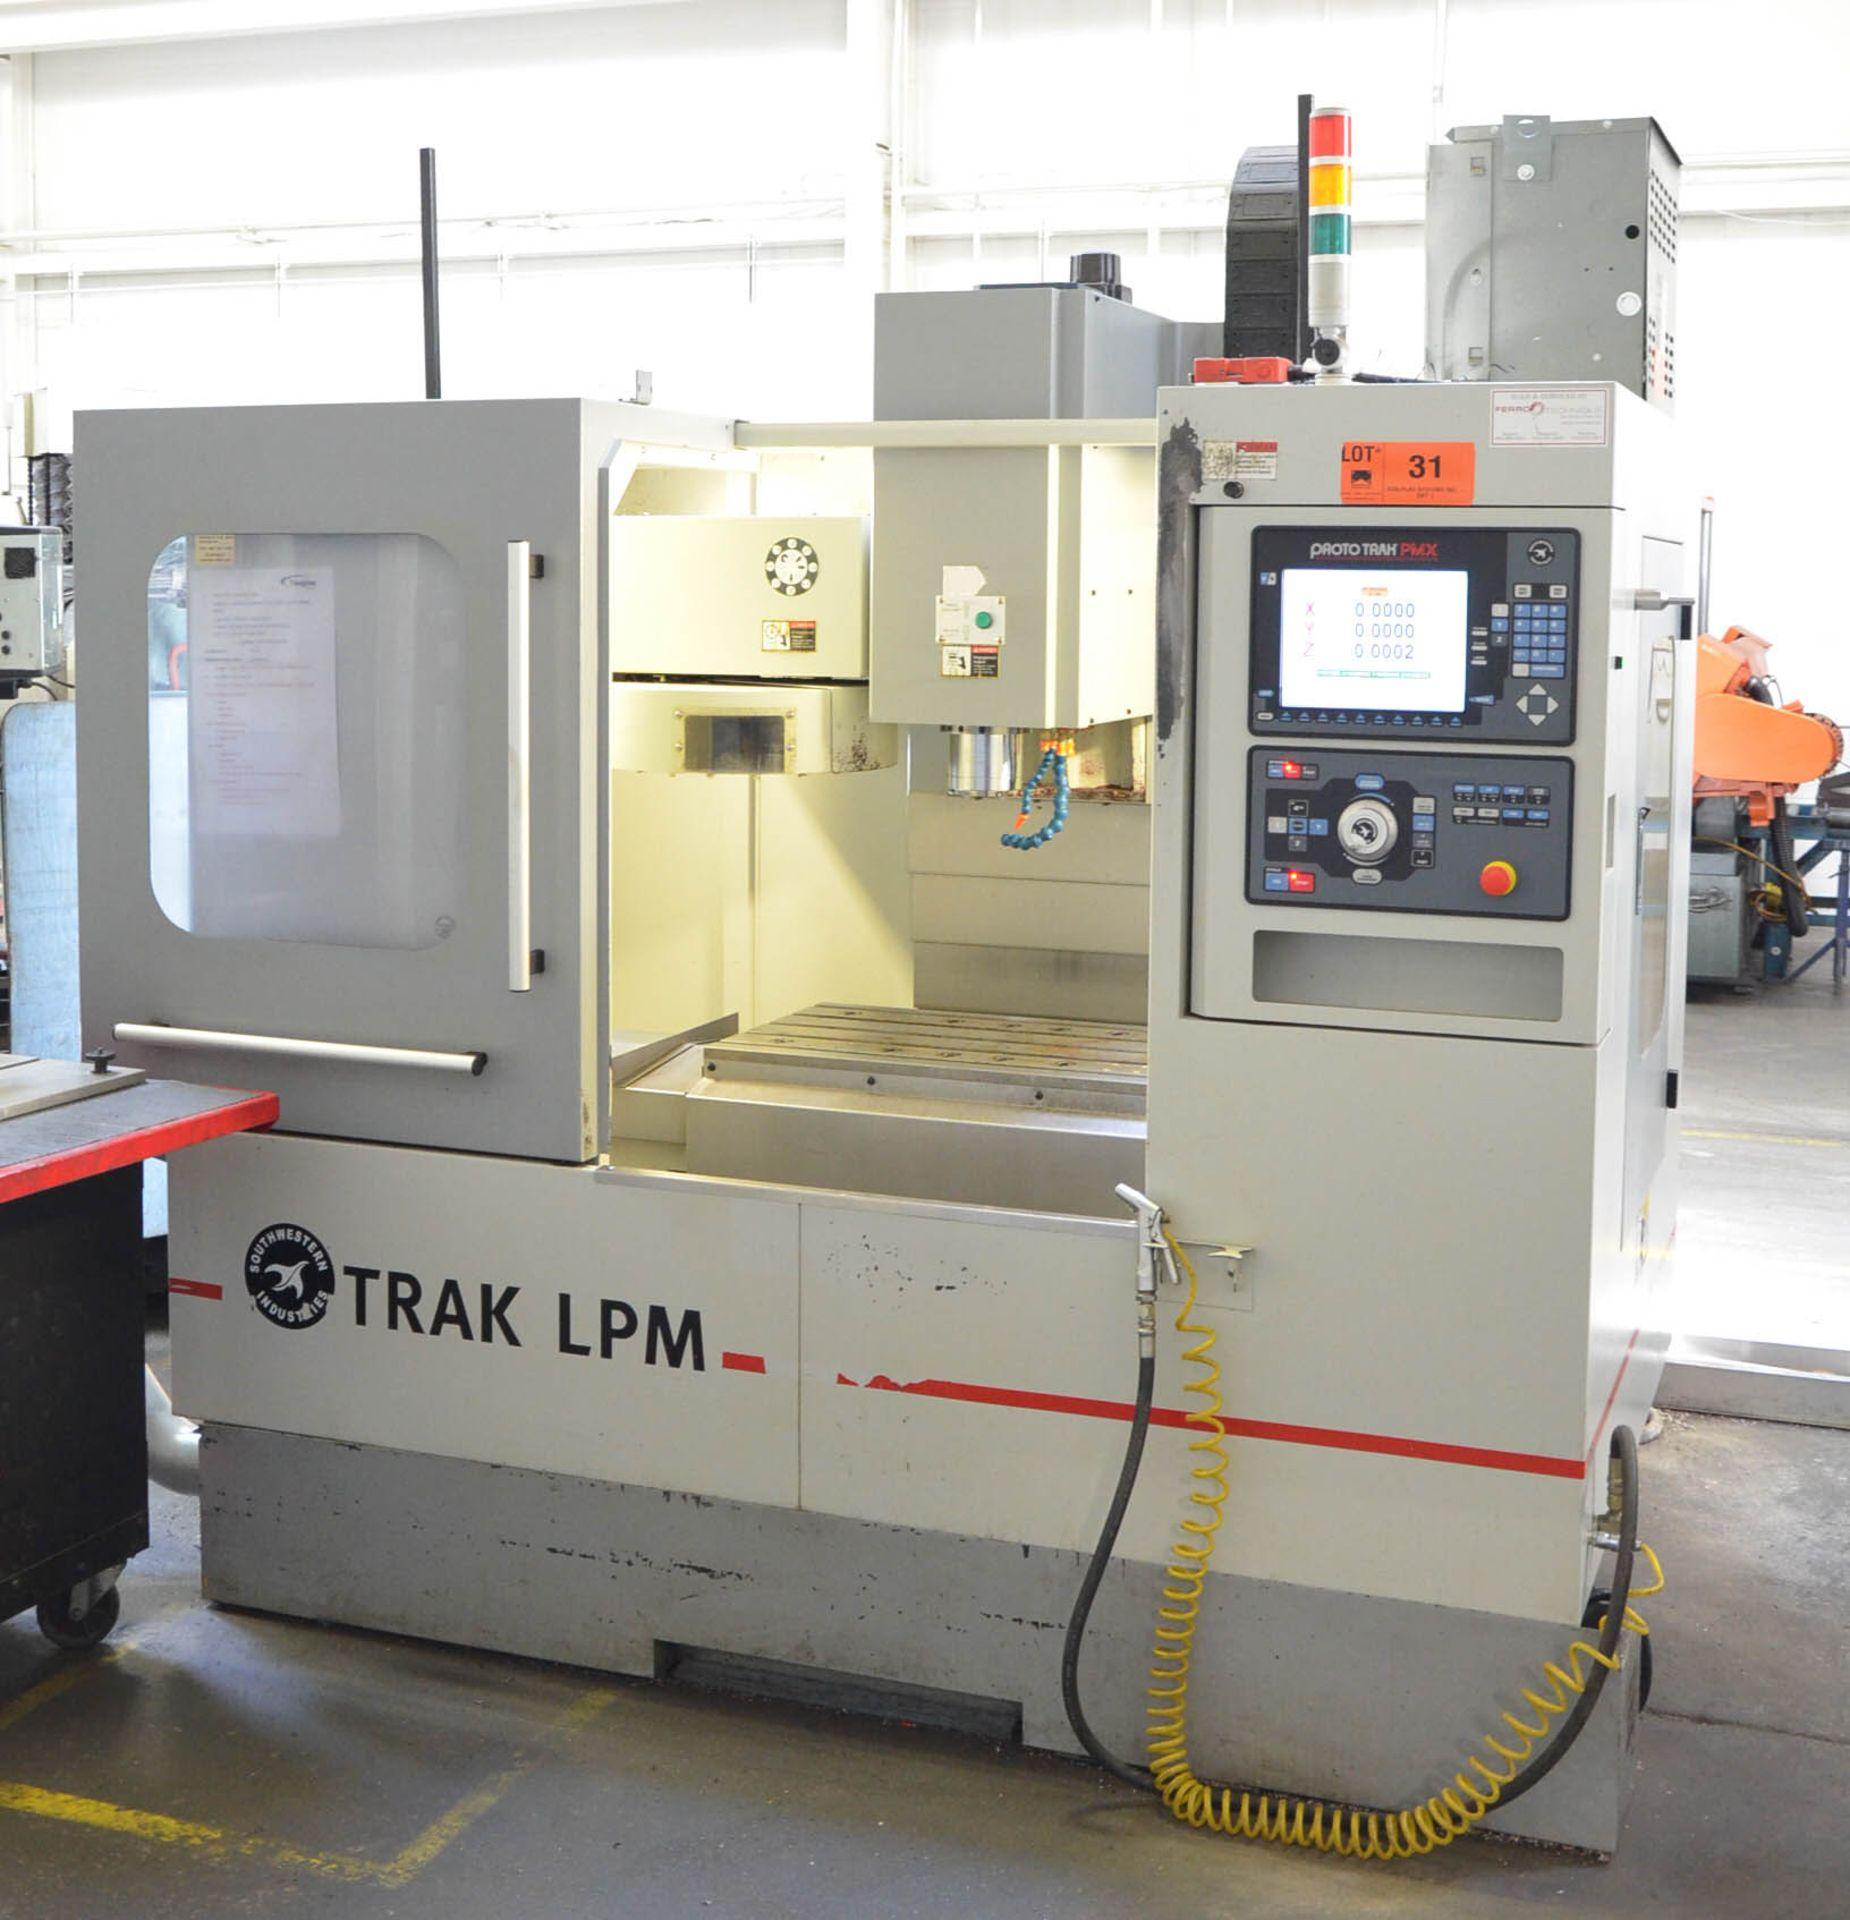 SWI (2014) TRAK LPM 4-AXIS READY CNC VERTICAL MACHINING CENTER WITH PROTO TRAK PMX CNC CONTROL, 19. - Image 2 of 12